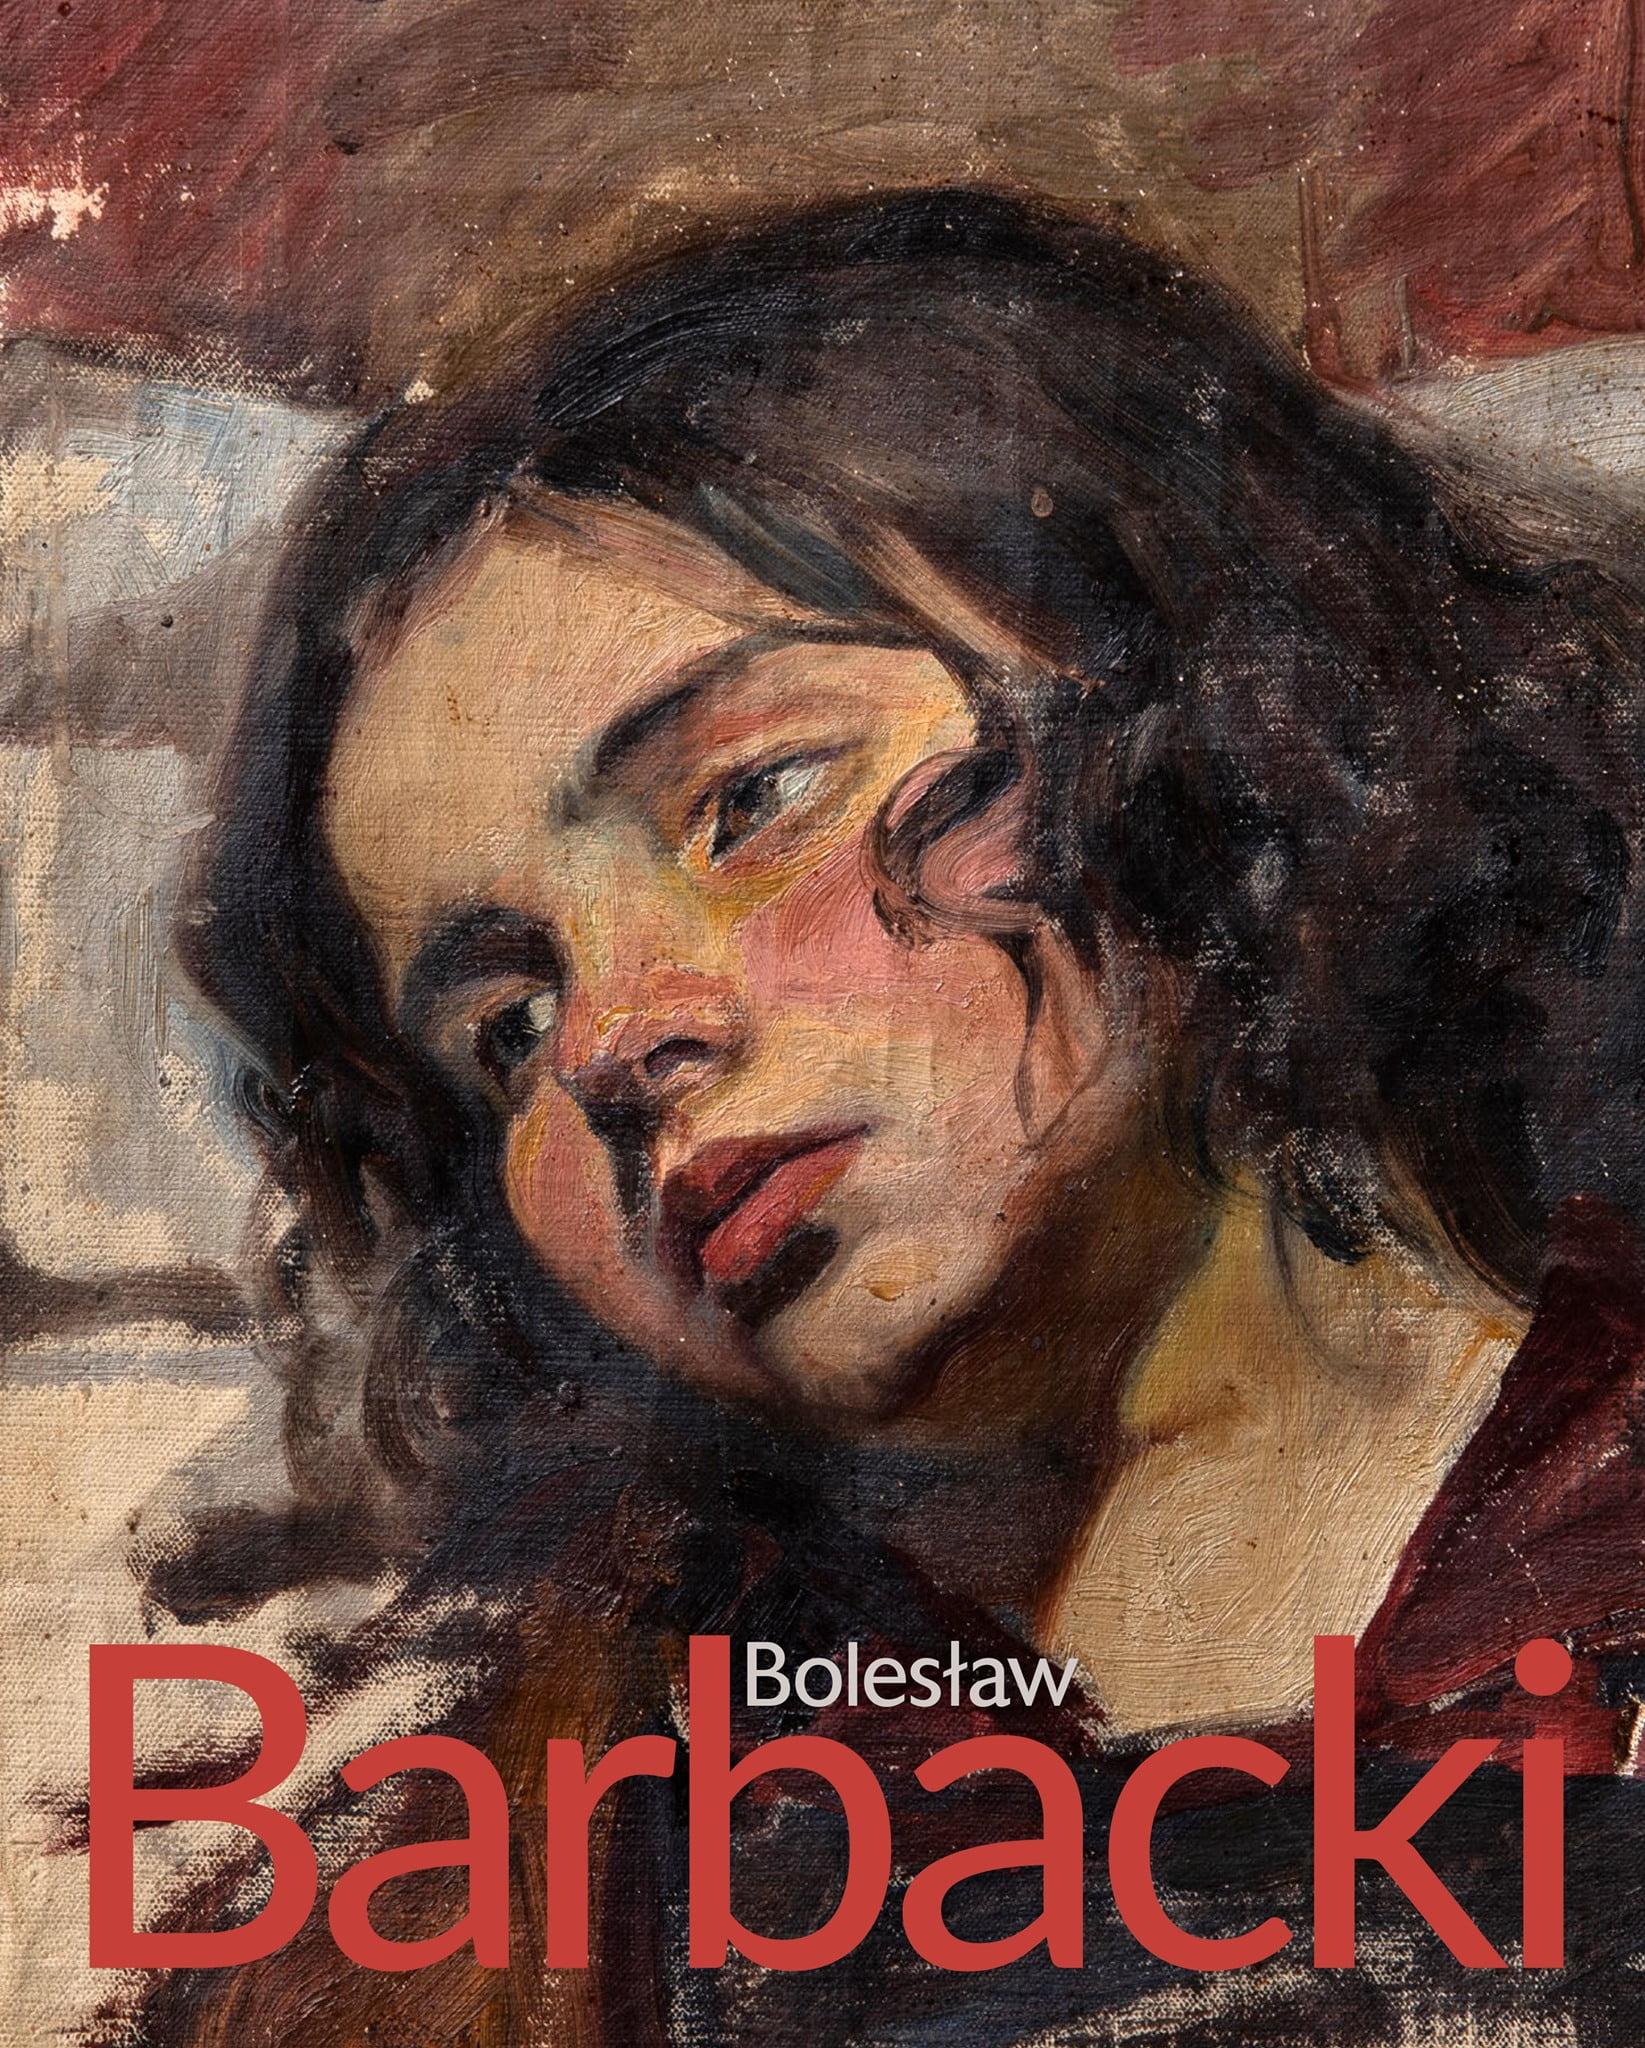 Helenka Barbacka